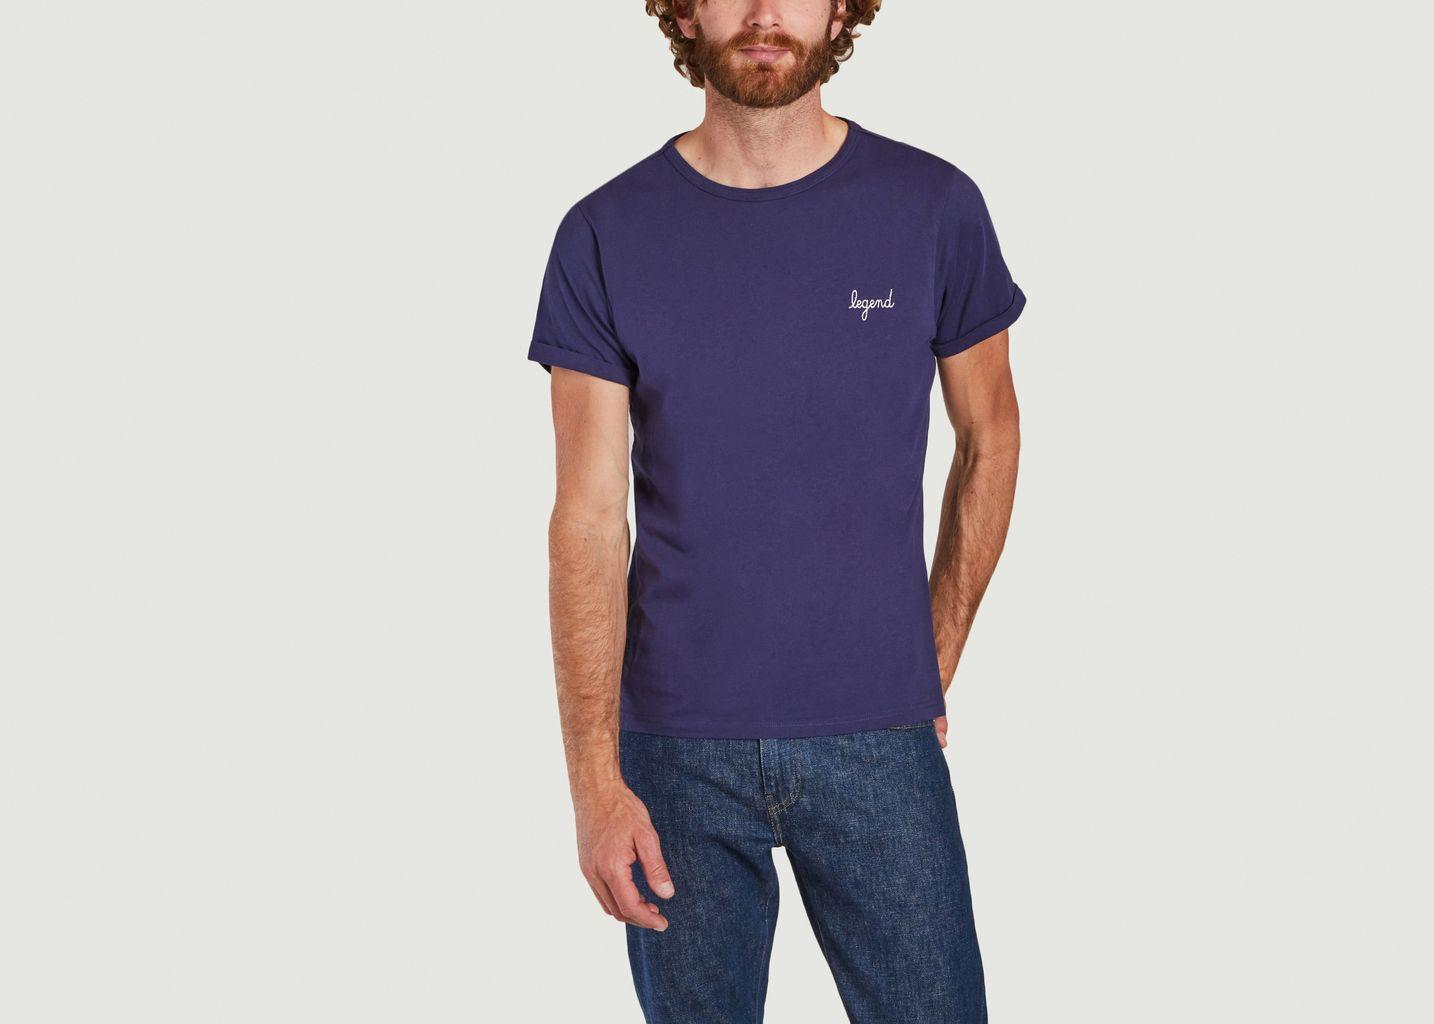 T-shirt poitou  - Maison Labiche